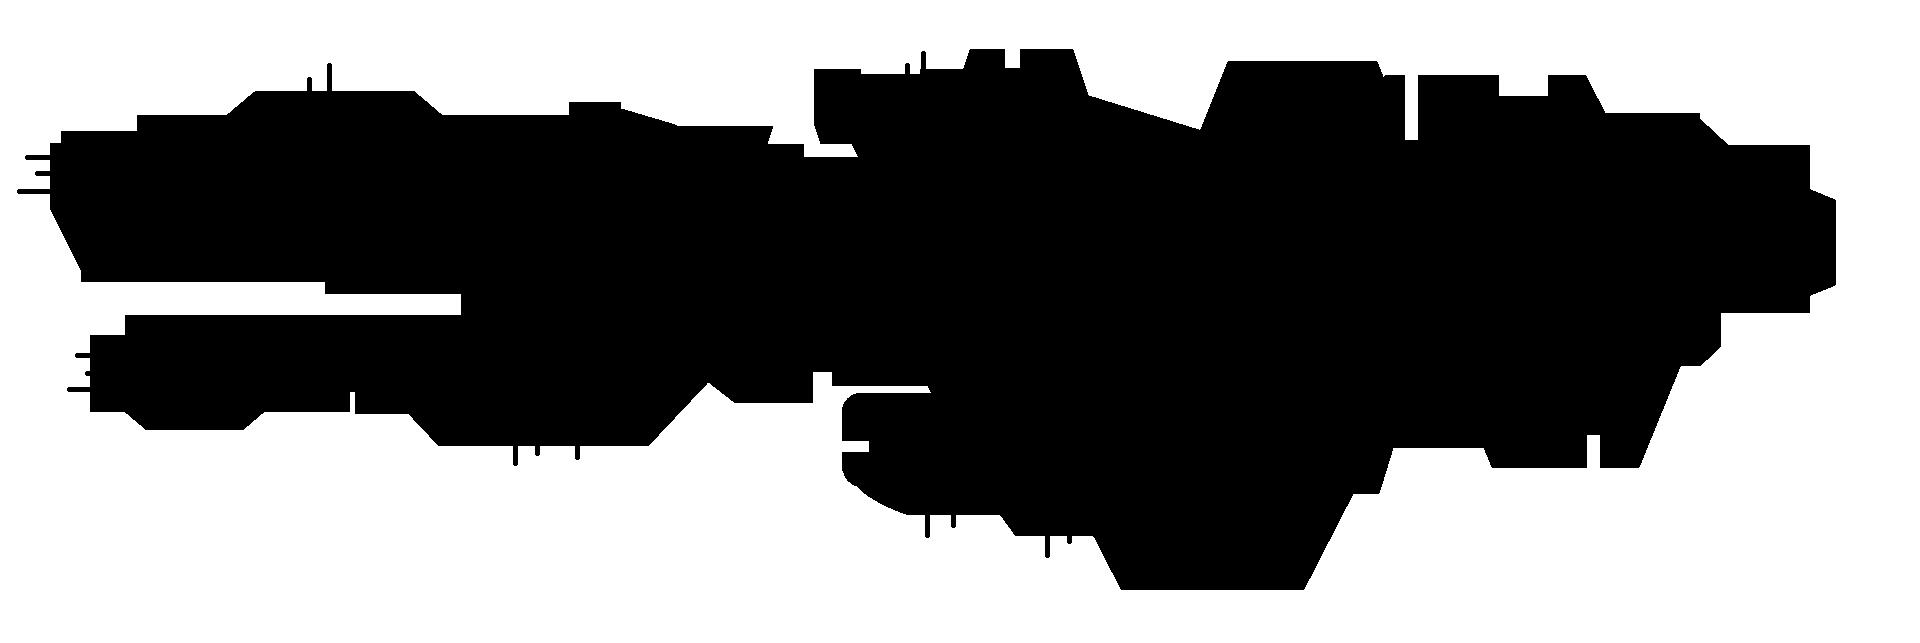 Alaris-class heavy frigate